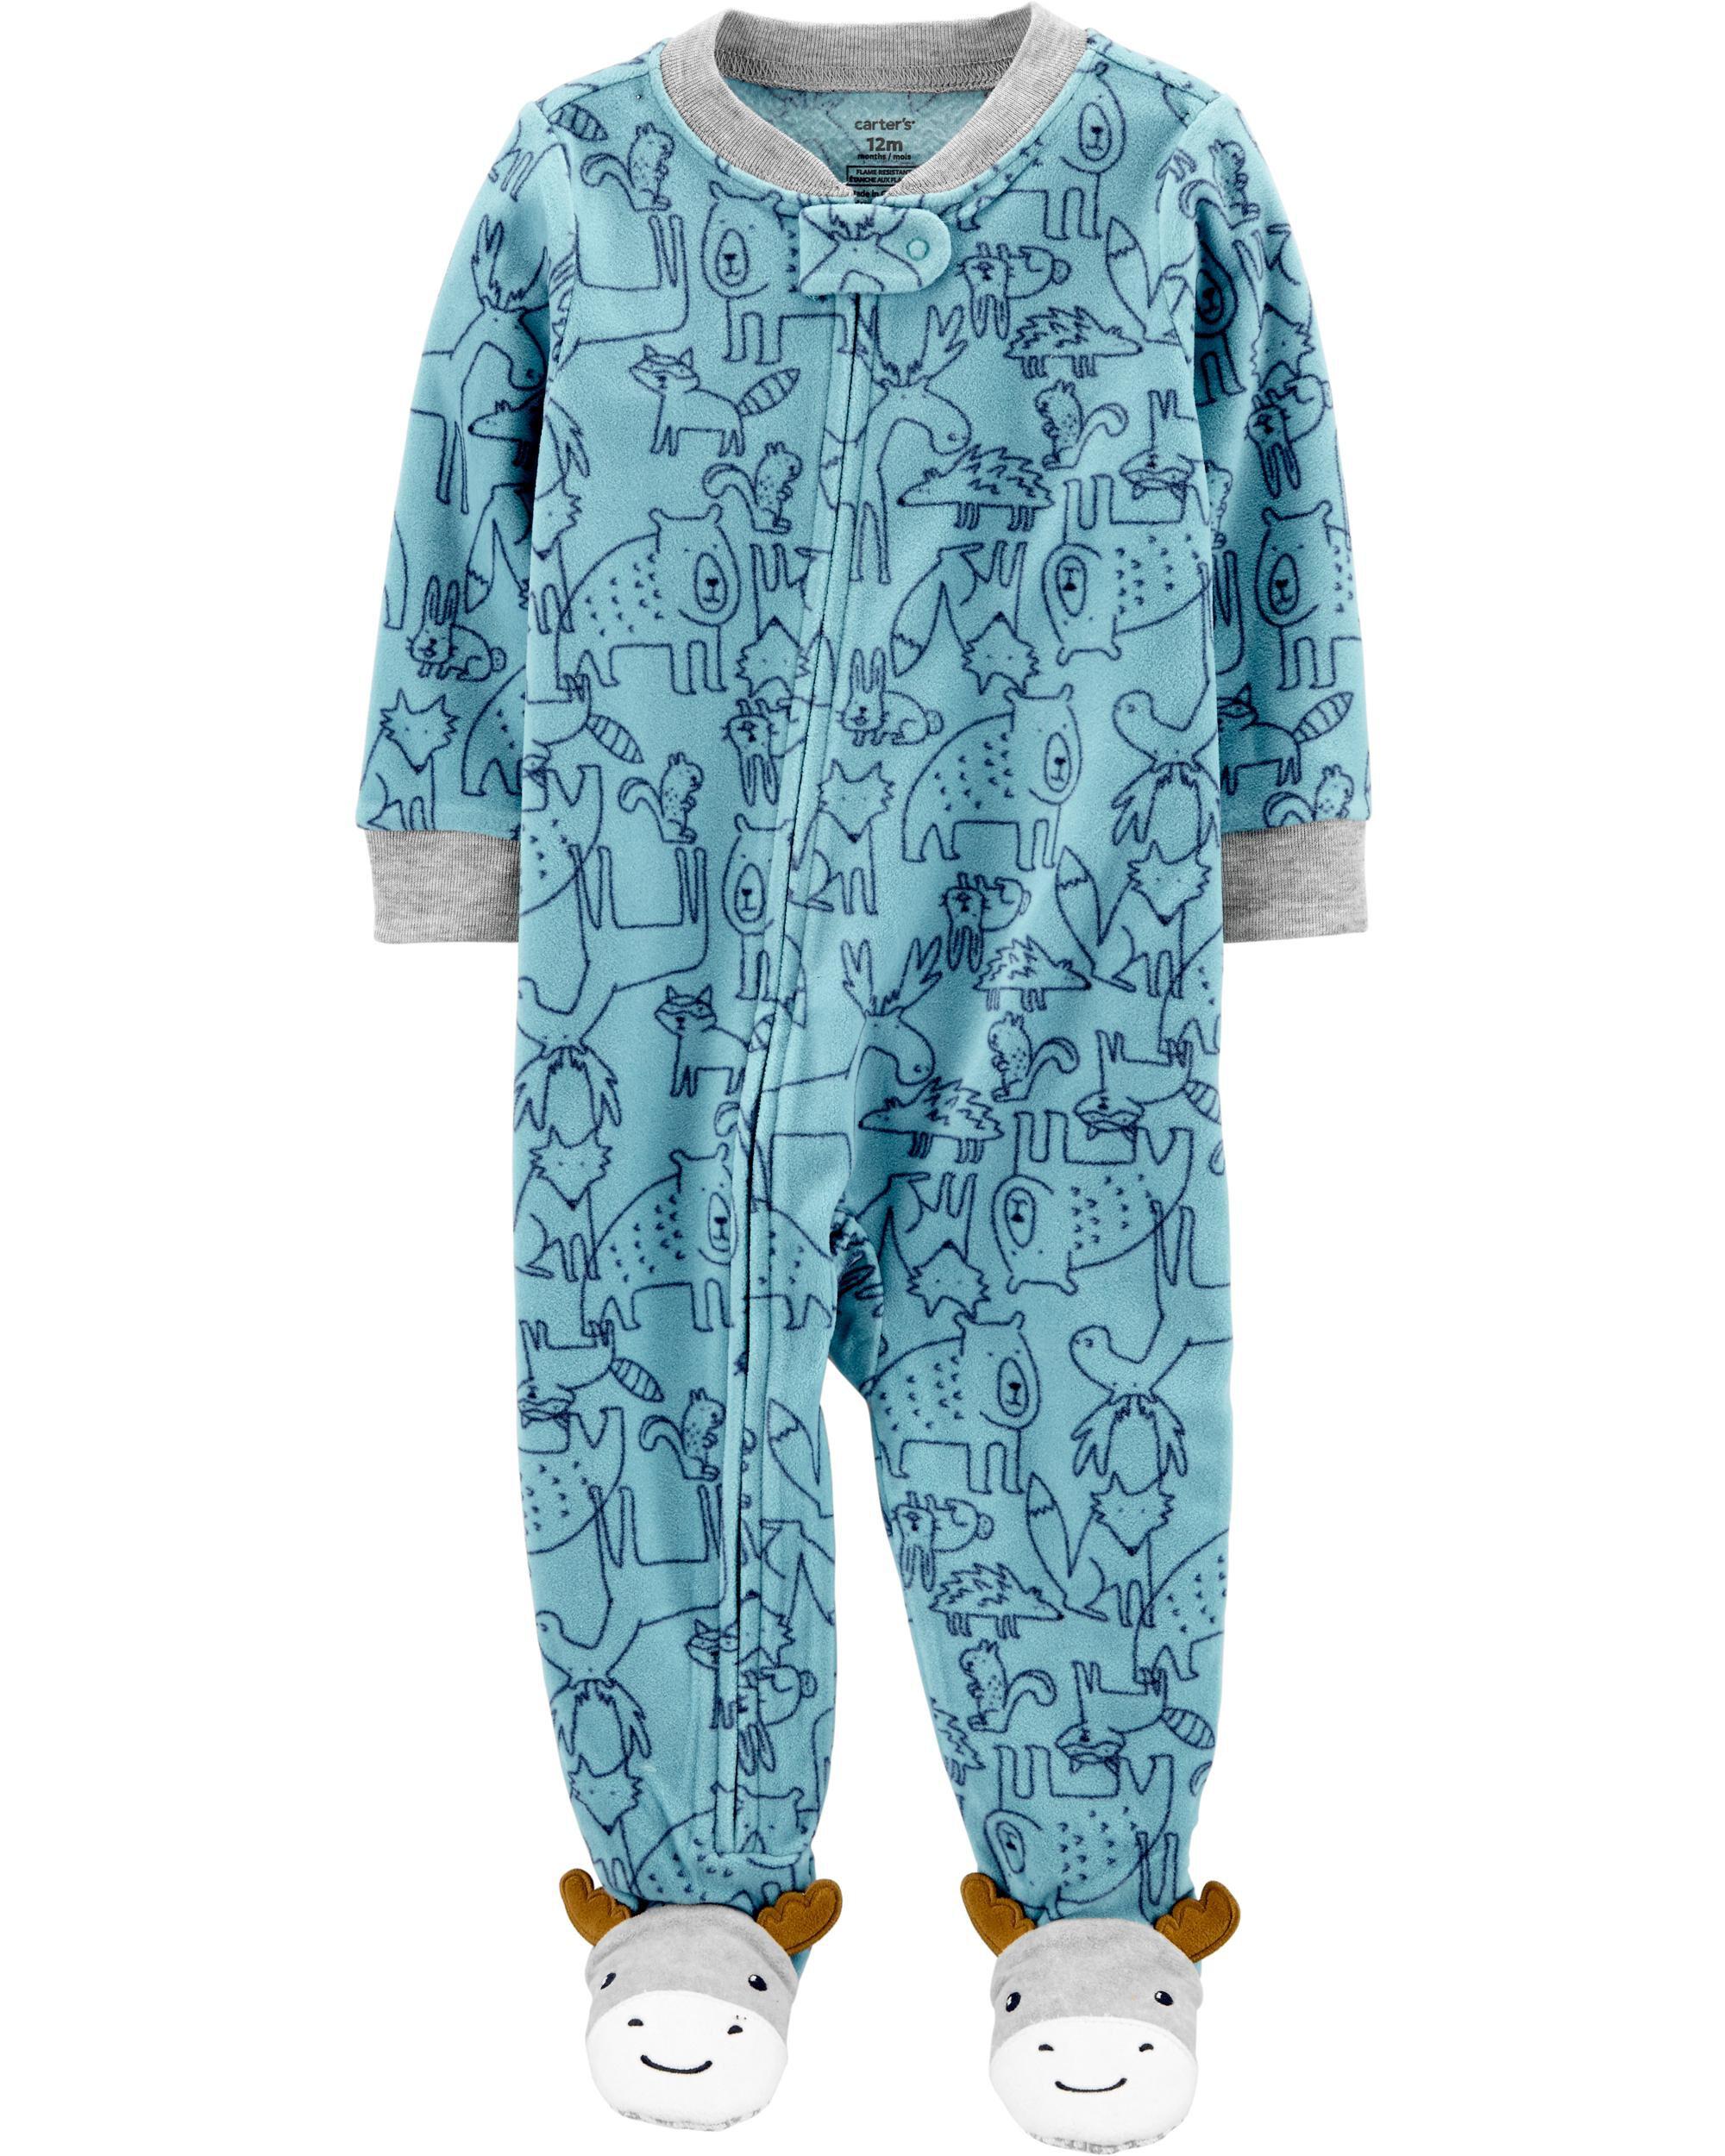 Baby Boy Fleece Footed Carters Sleeper Pajamas Size 4T